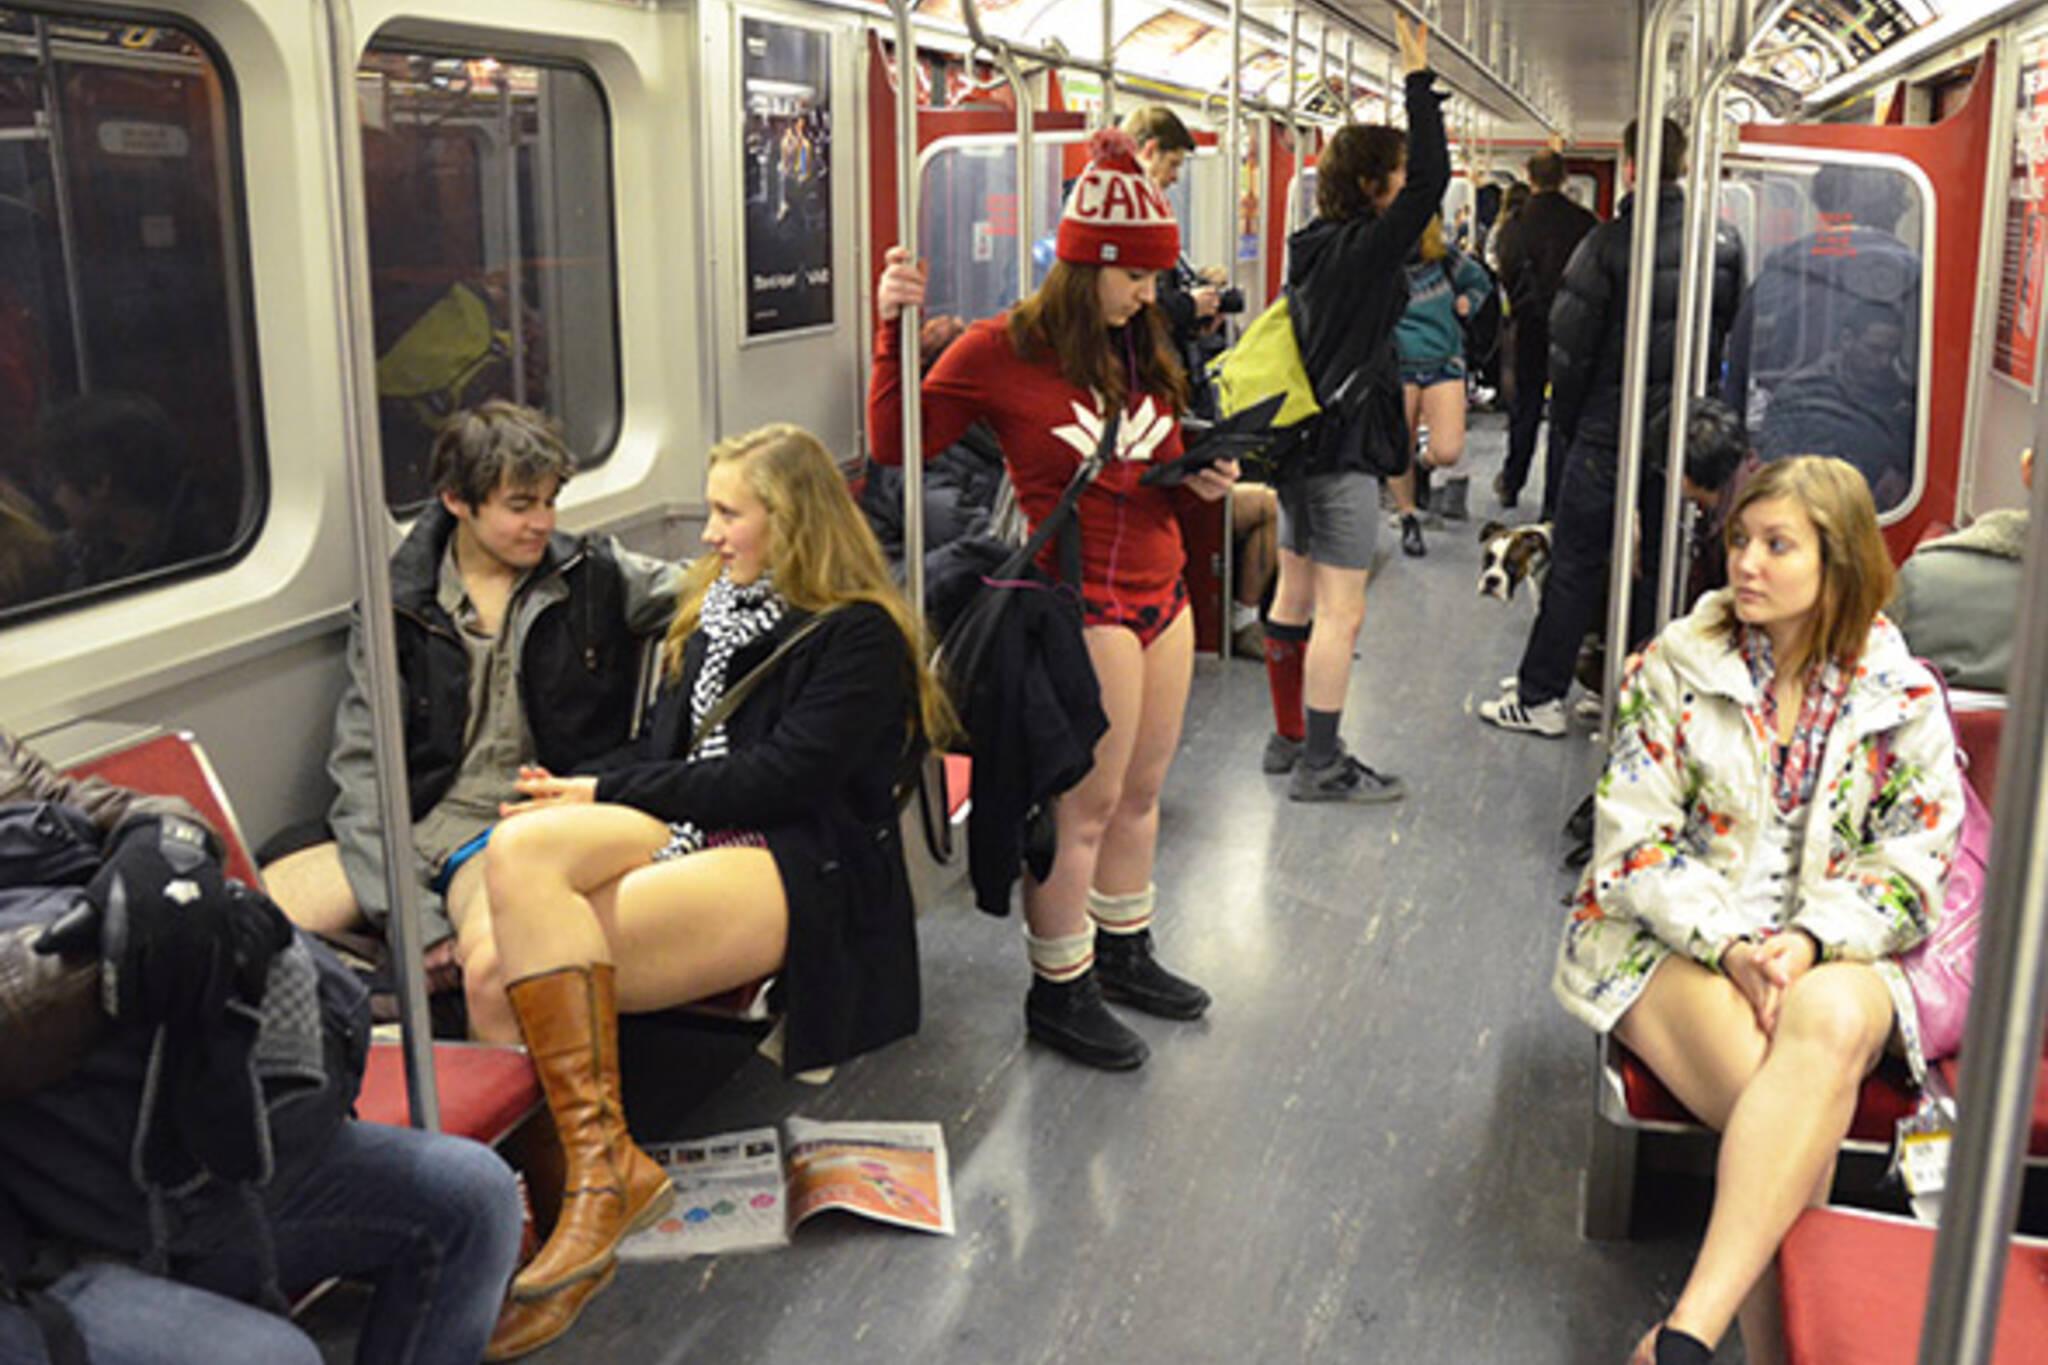 No Pants Subway Toronto